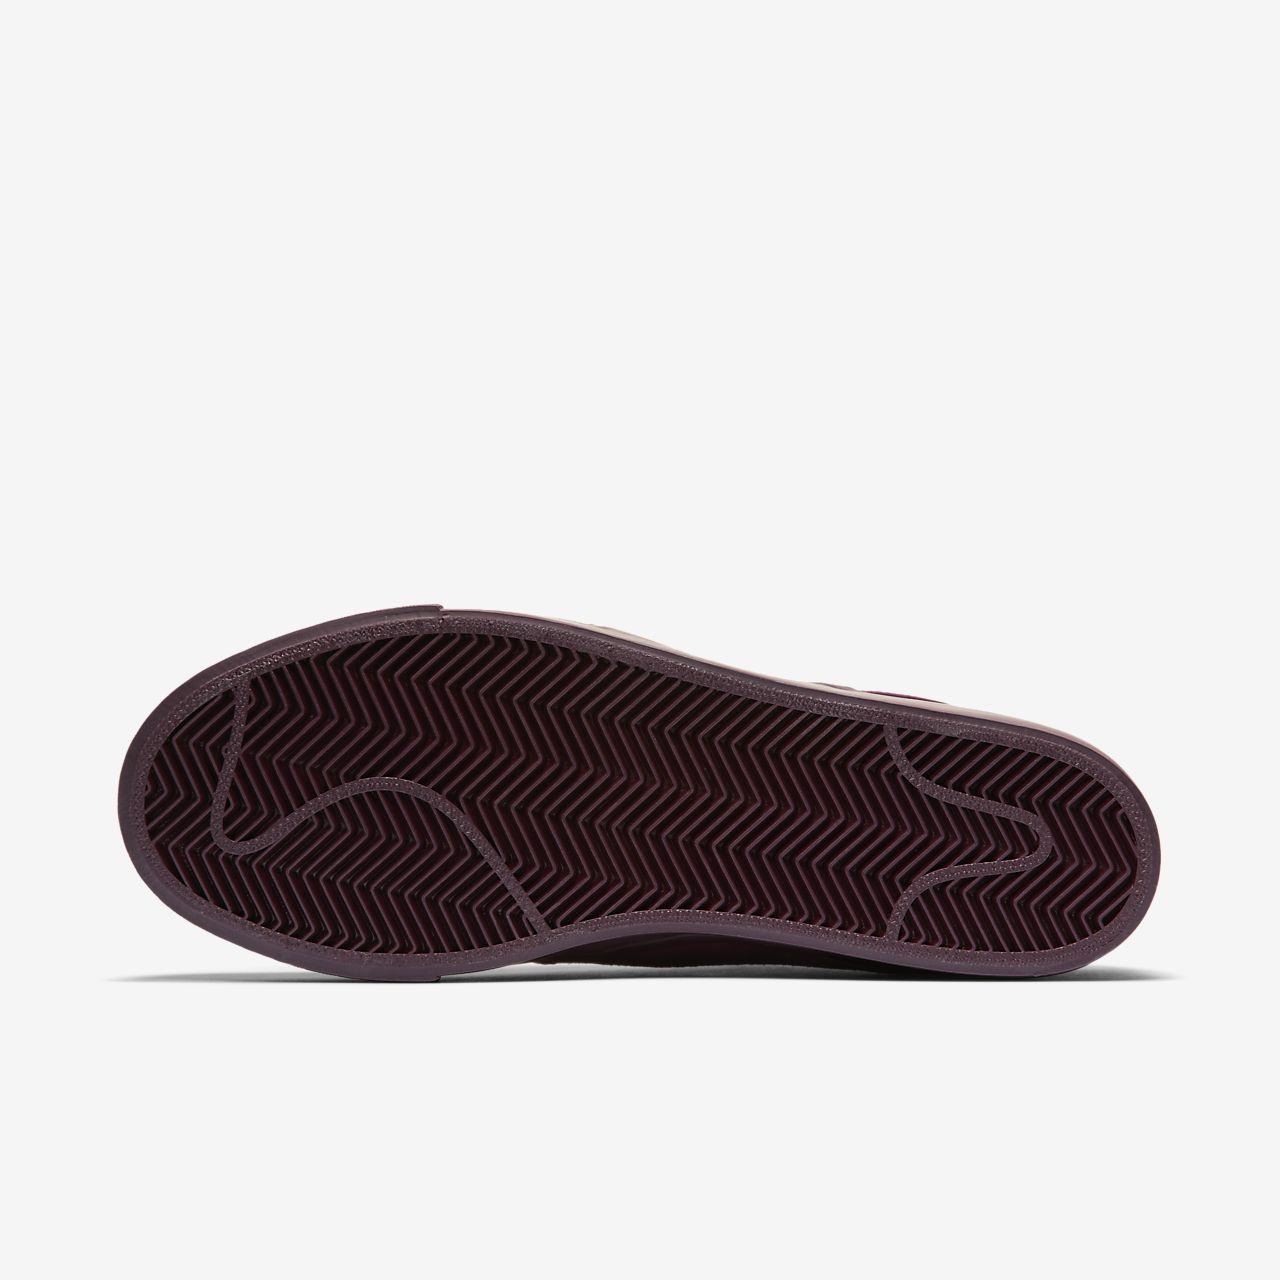 04fa3f25bea9e Nike Zoom Stefan Janoski Zapatillas de skateboard - Hombre. Nike.com ES